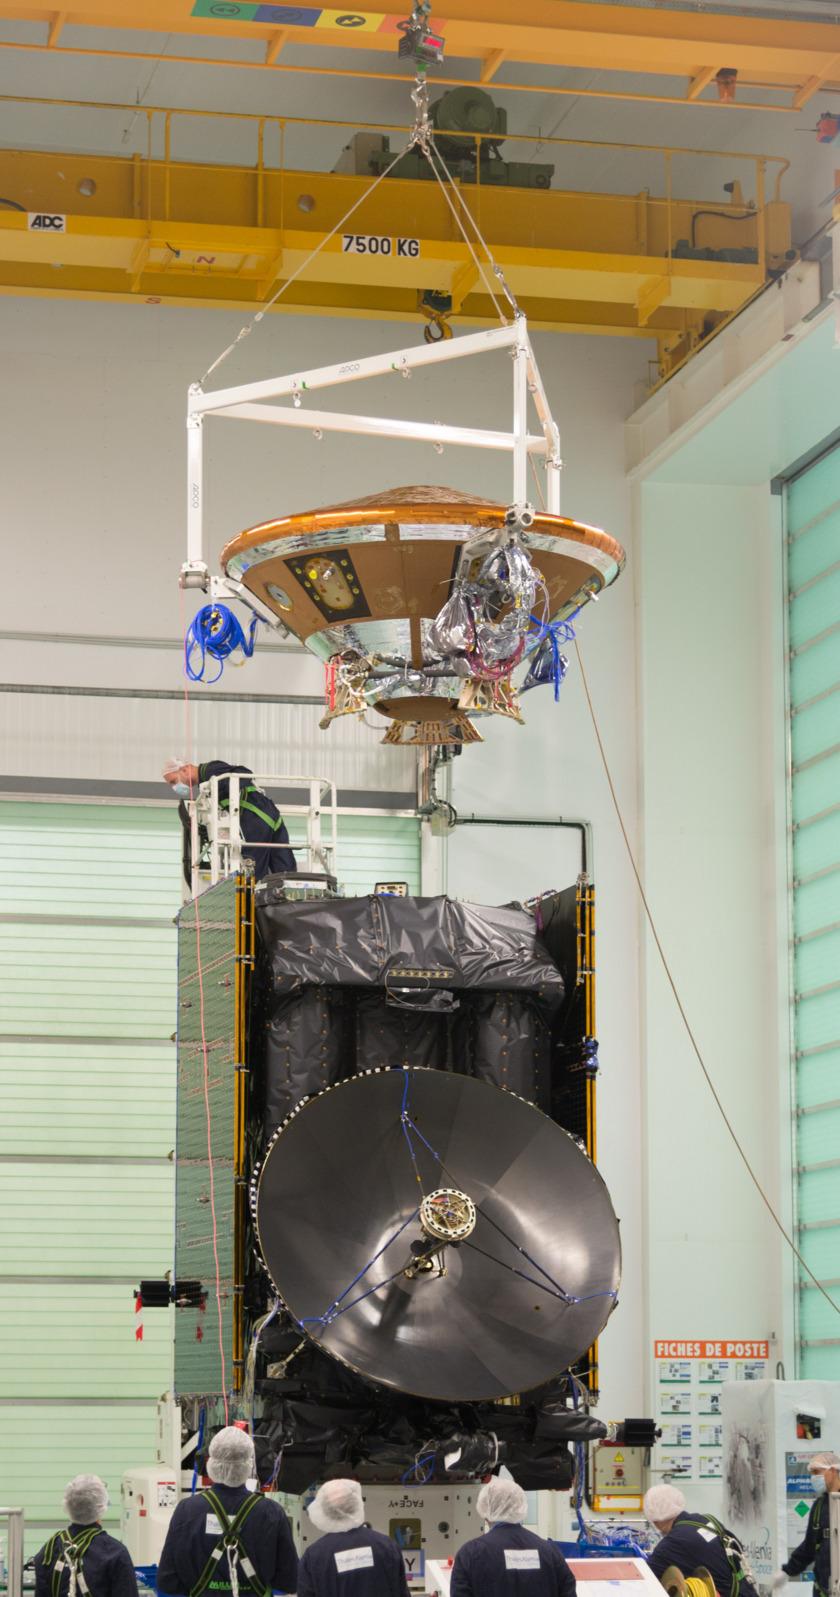 Schiaparelli lander meets ExoMars orbiter